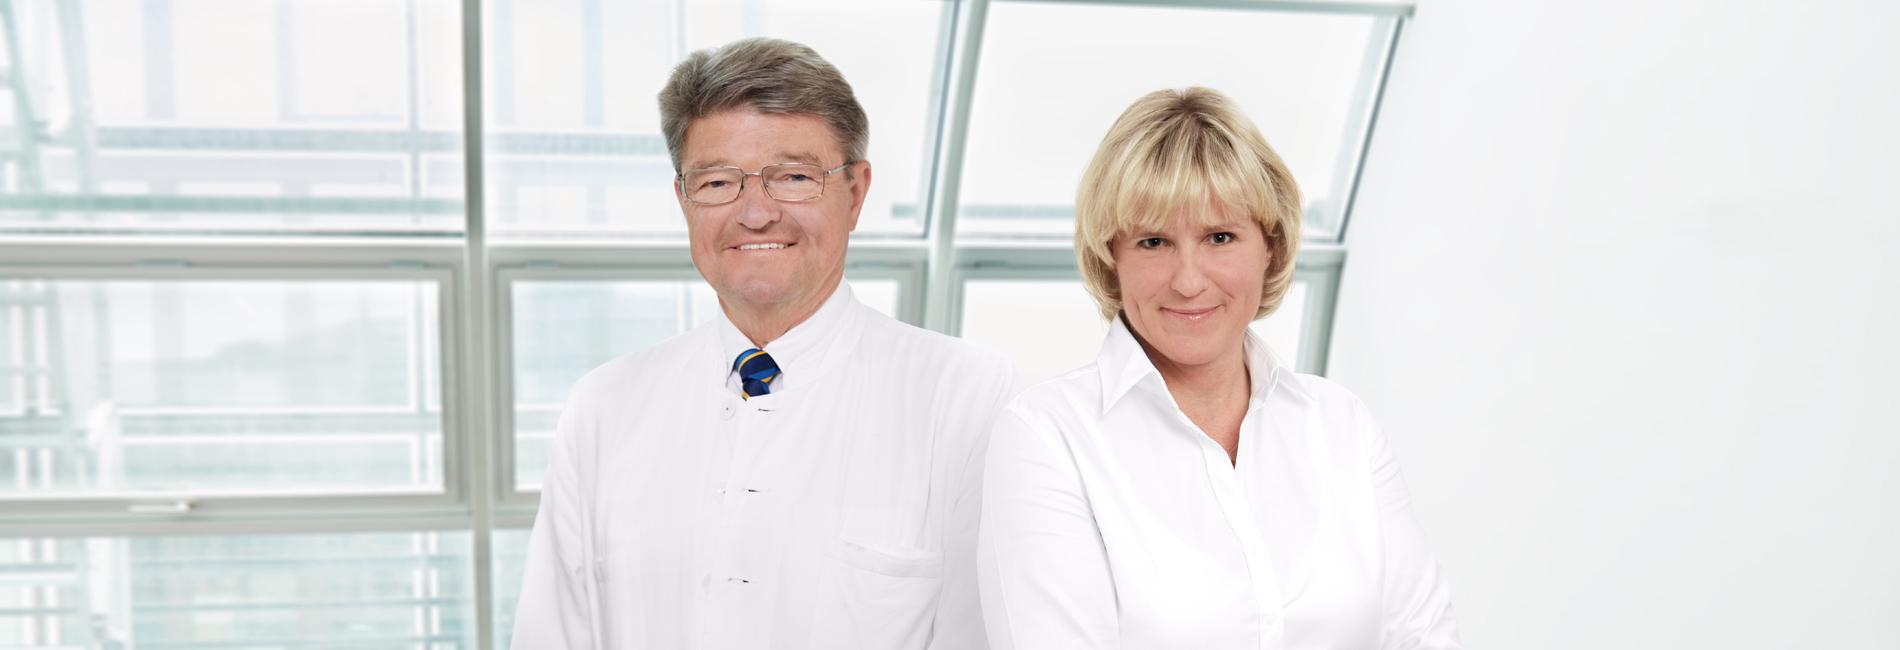 Prof-Magnussen-Dr-Timmermann-MEDIZINICUM-hamburg-1